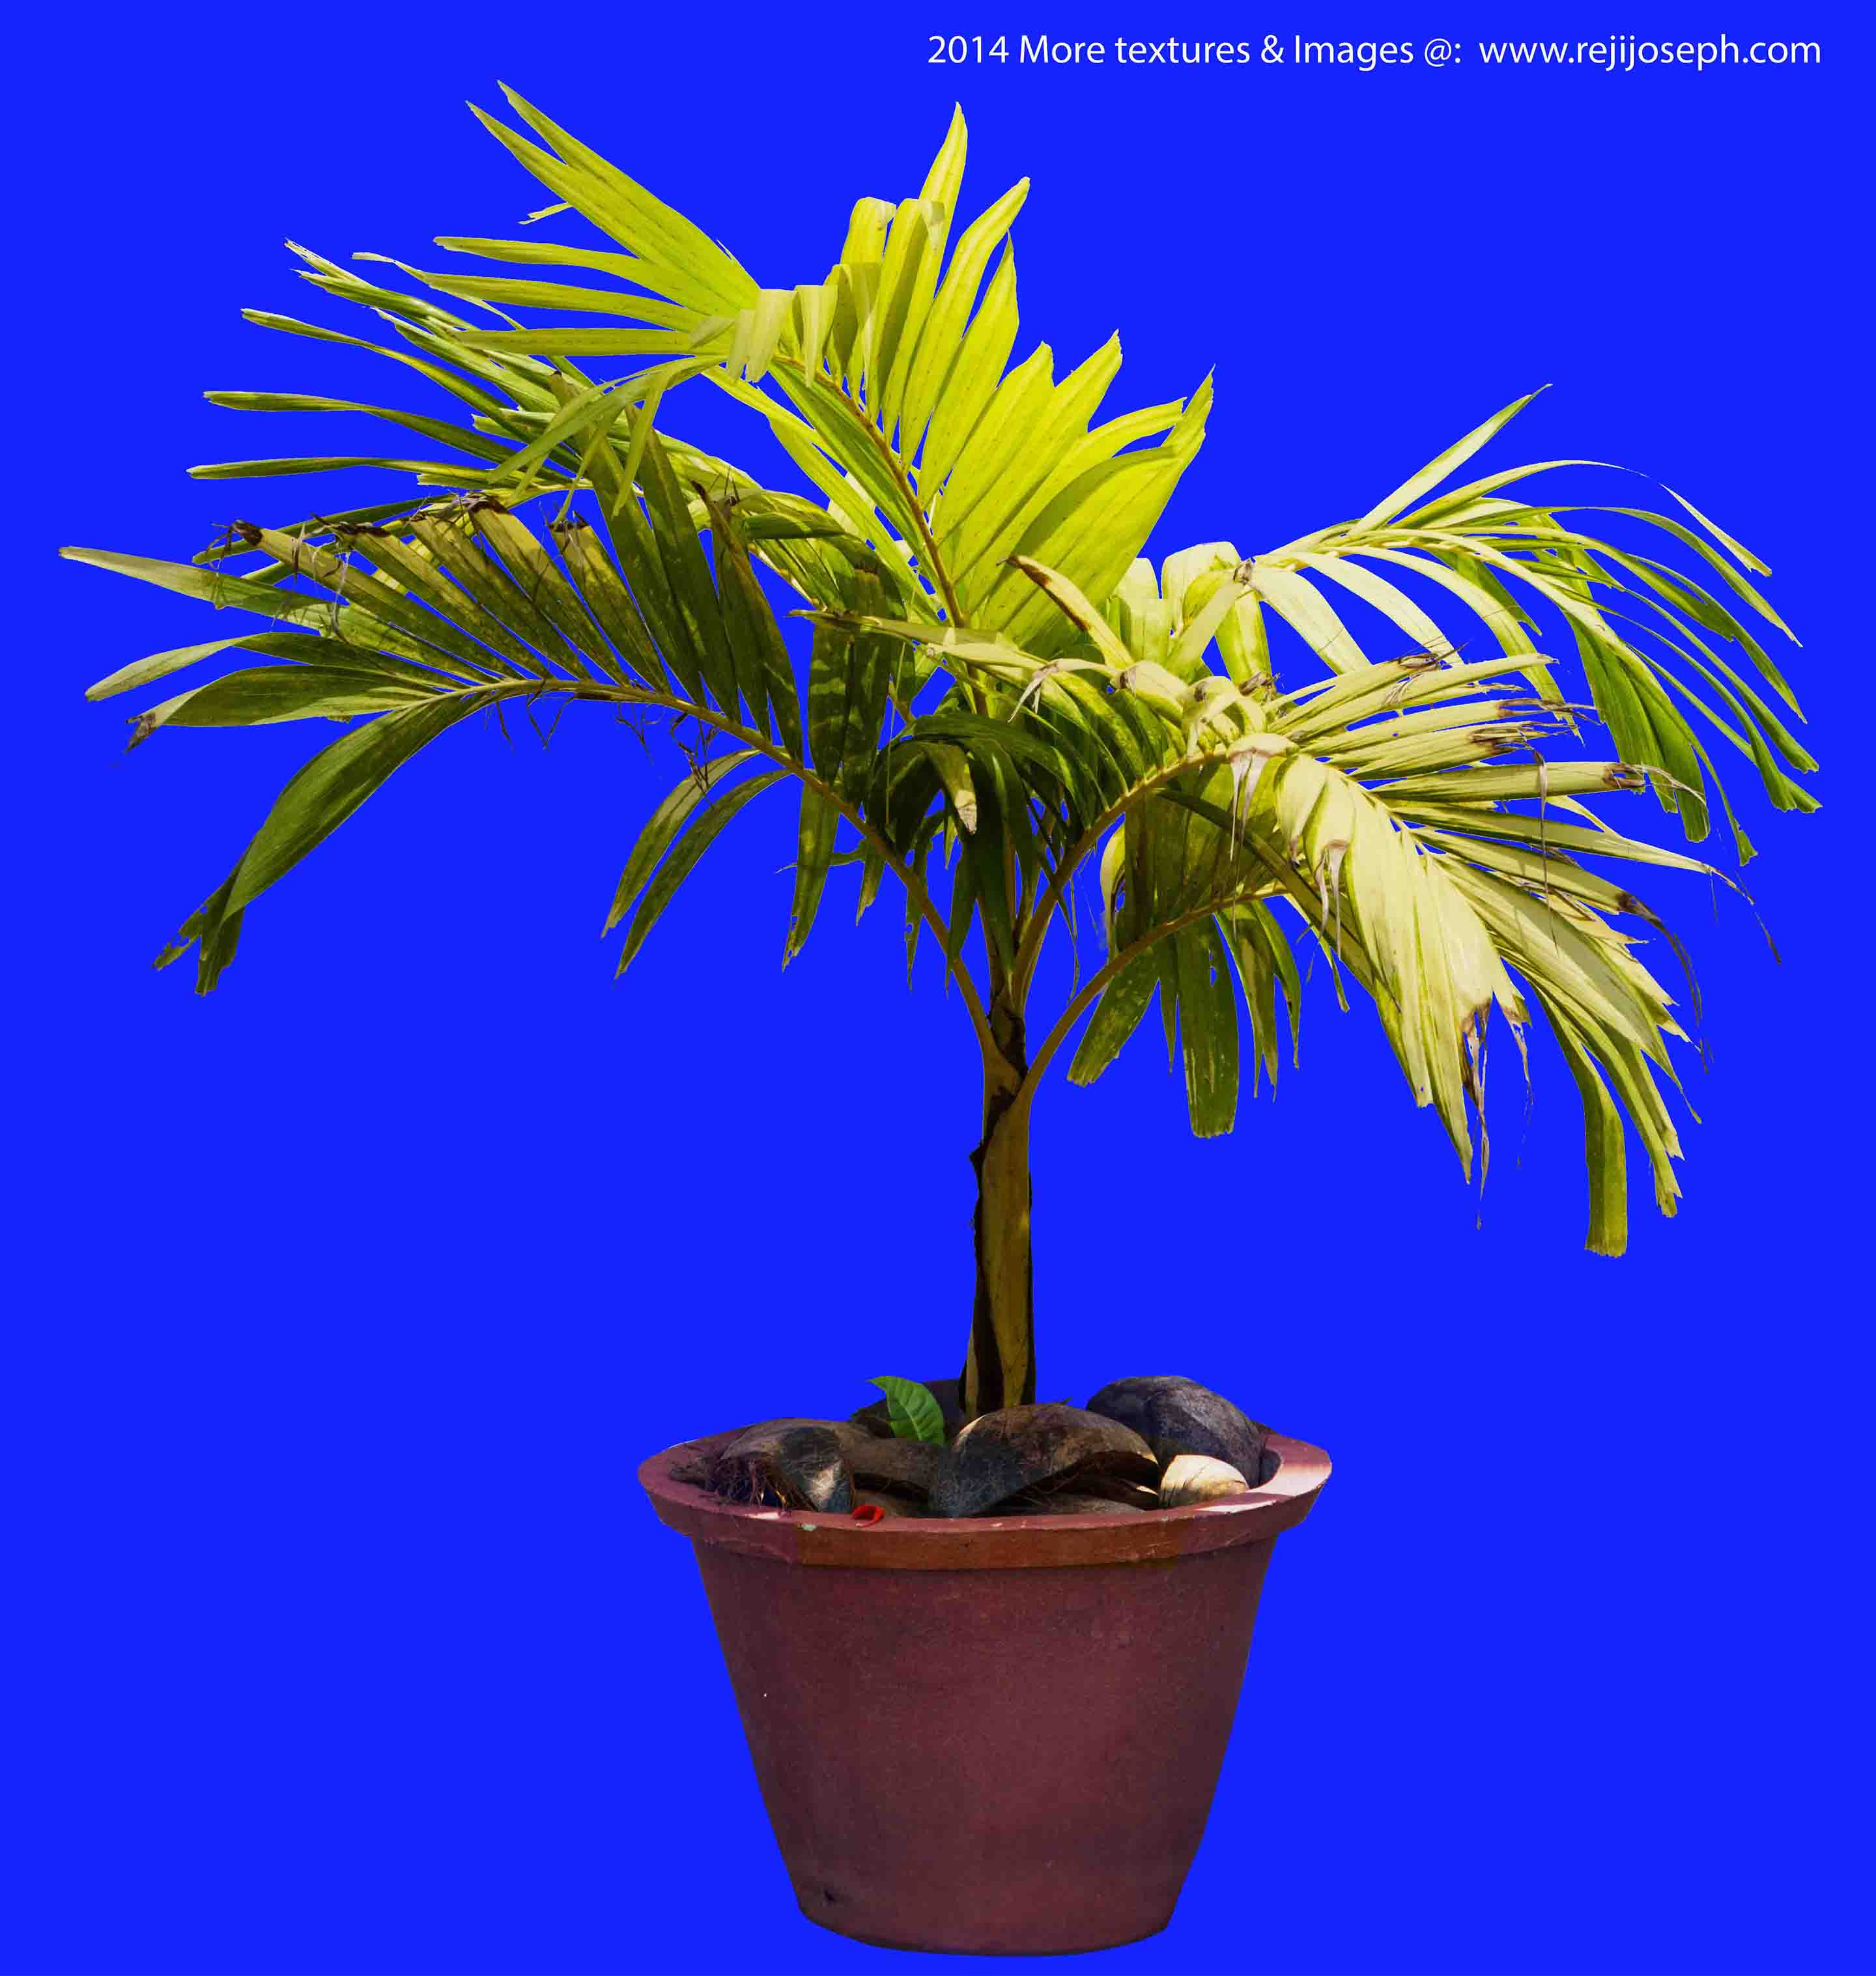 Betel nut palm tree Garden Plant Texture 00004